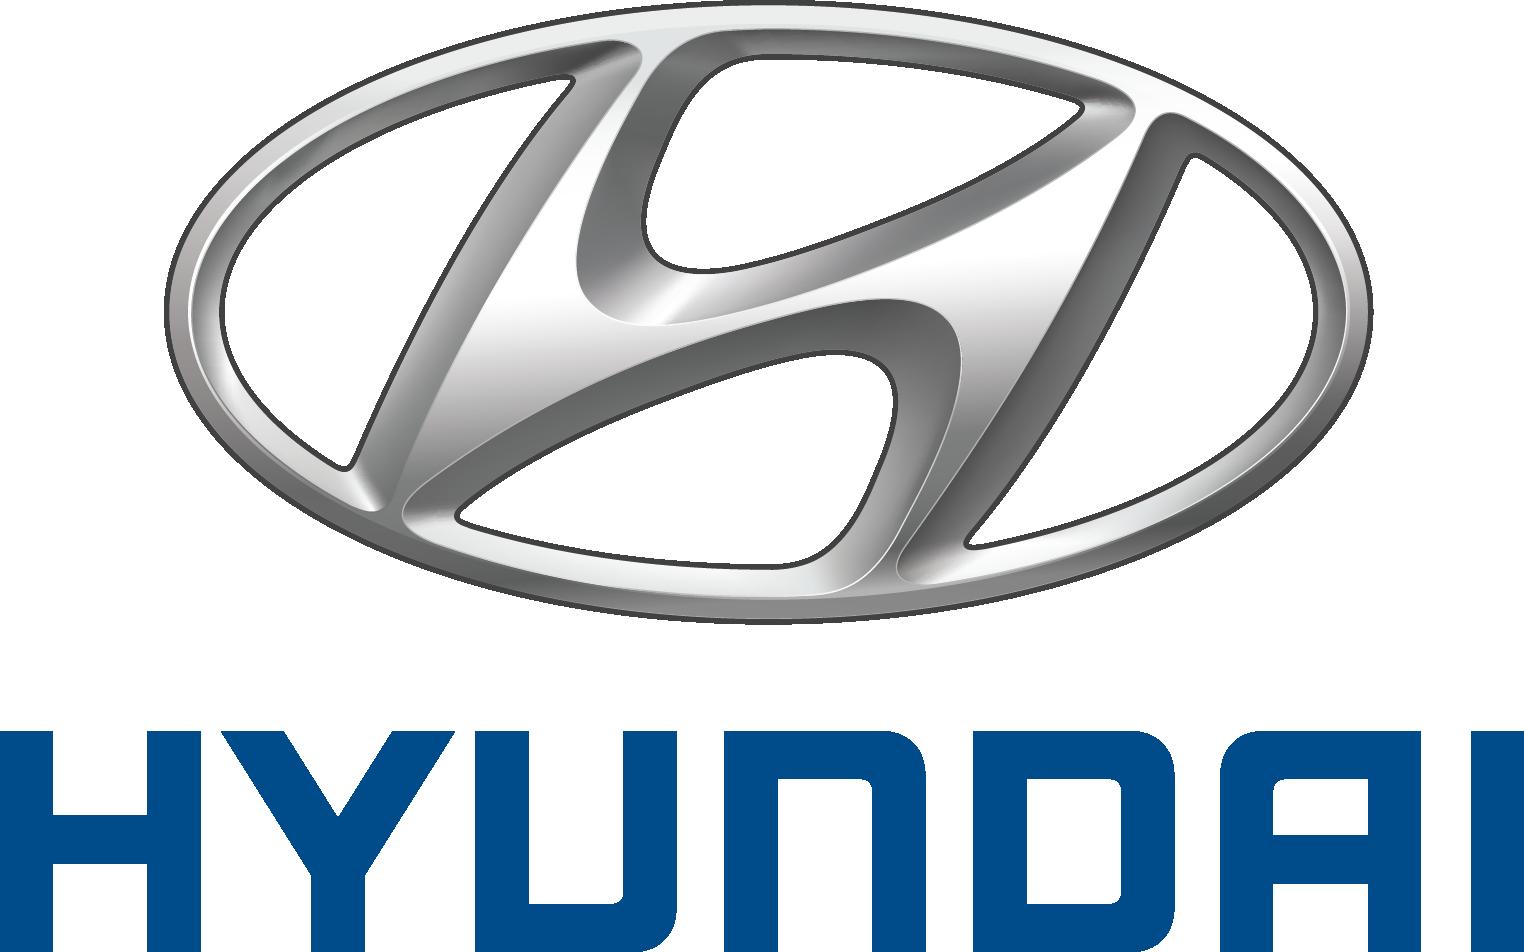 Hyundai stand alone logo